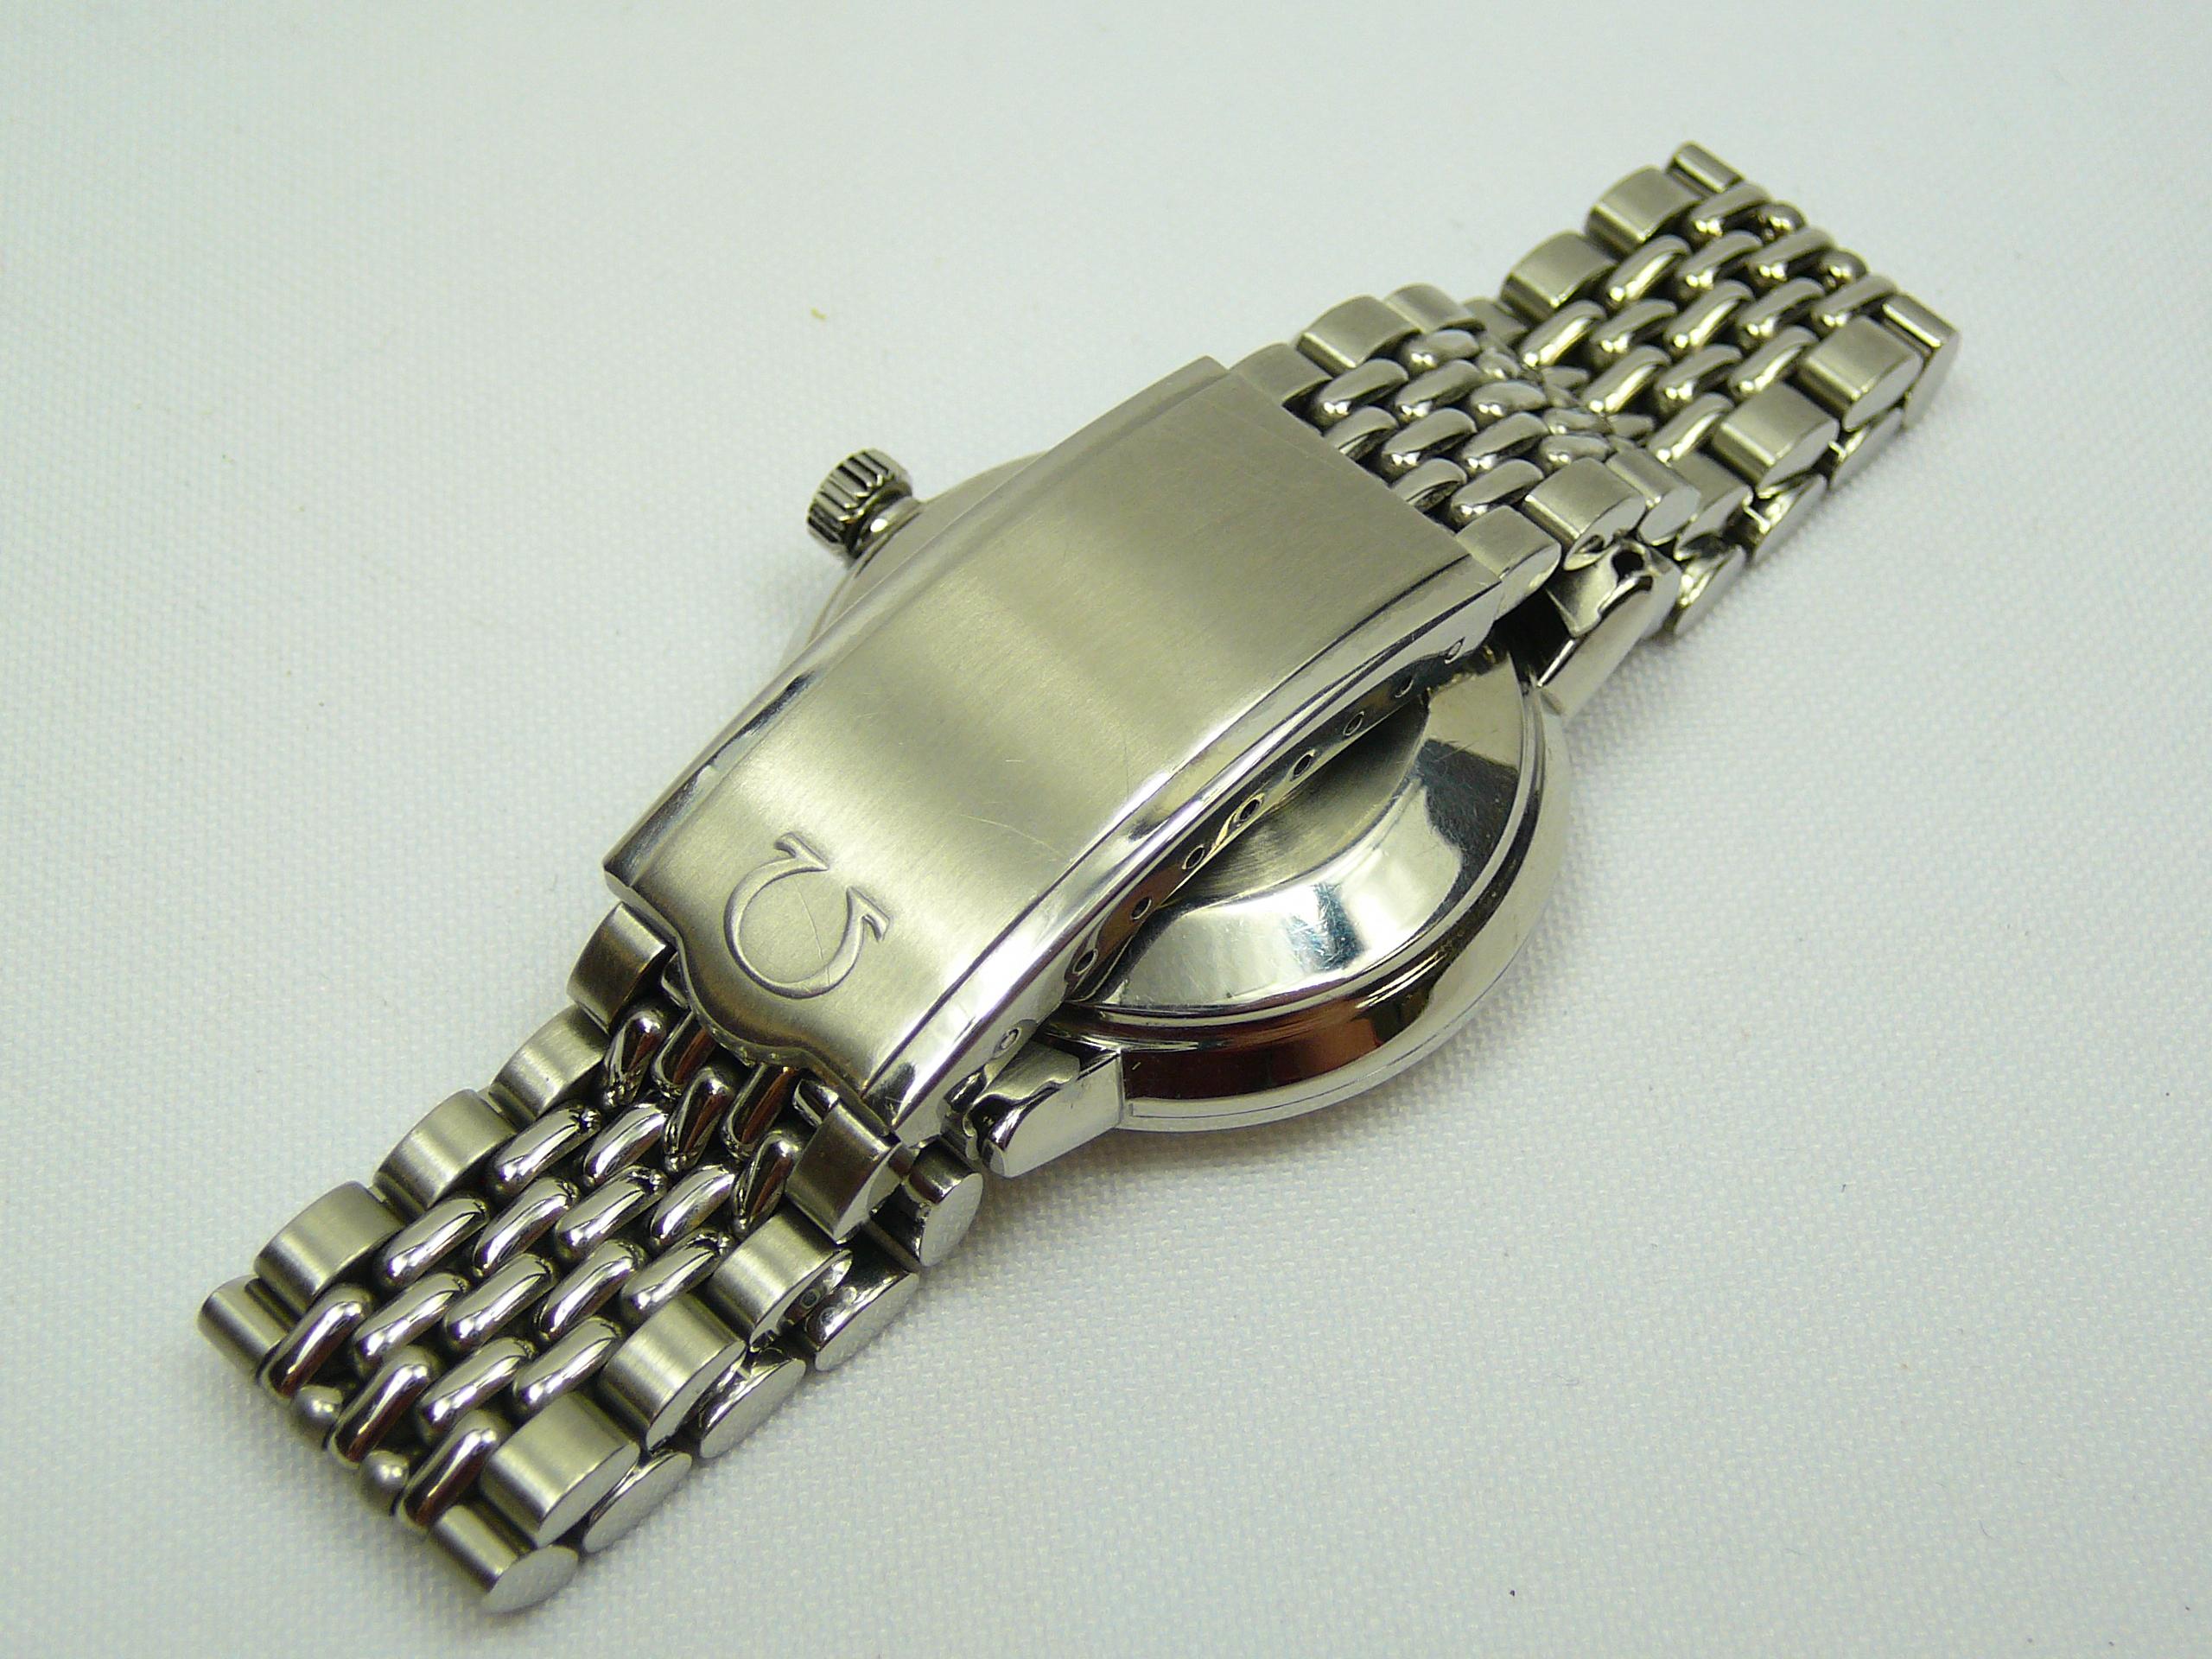 Gents Vintage Omega Wrist Watch - Image 3 of 4